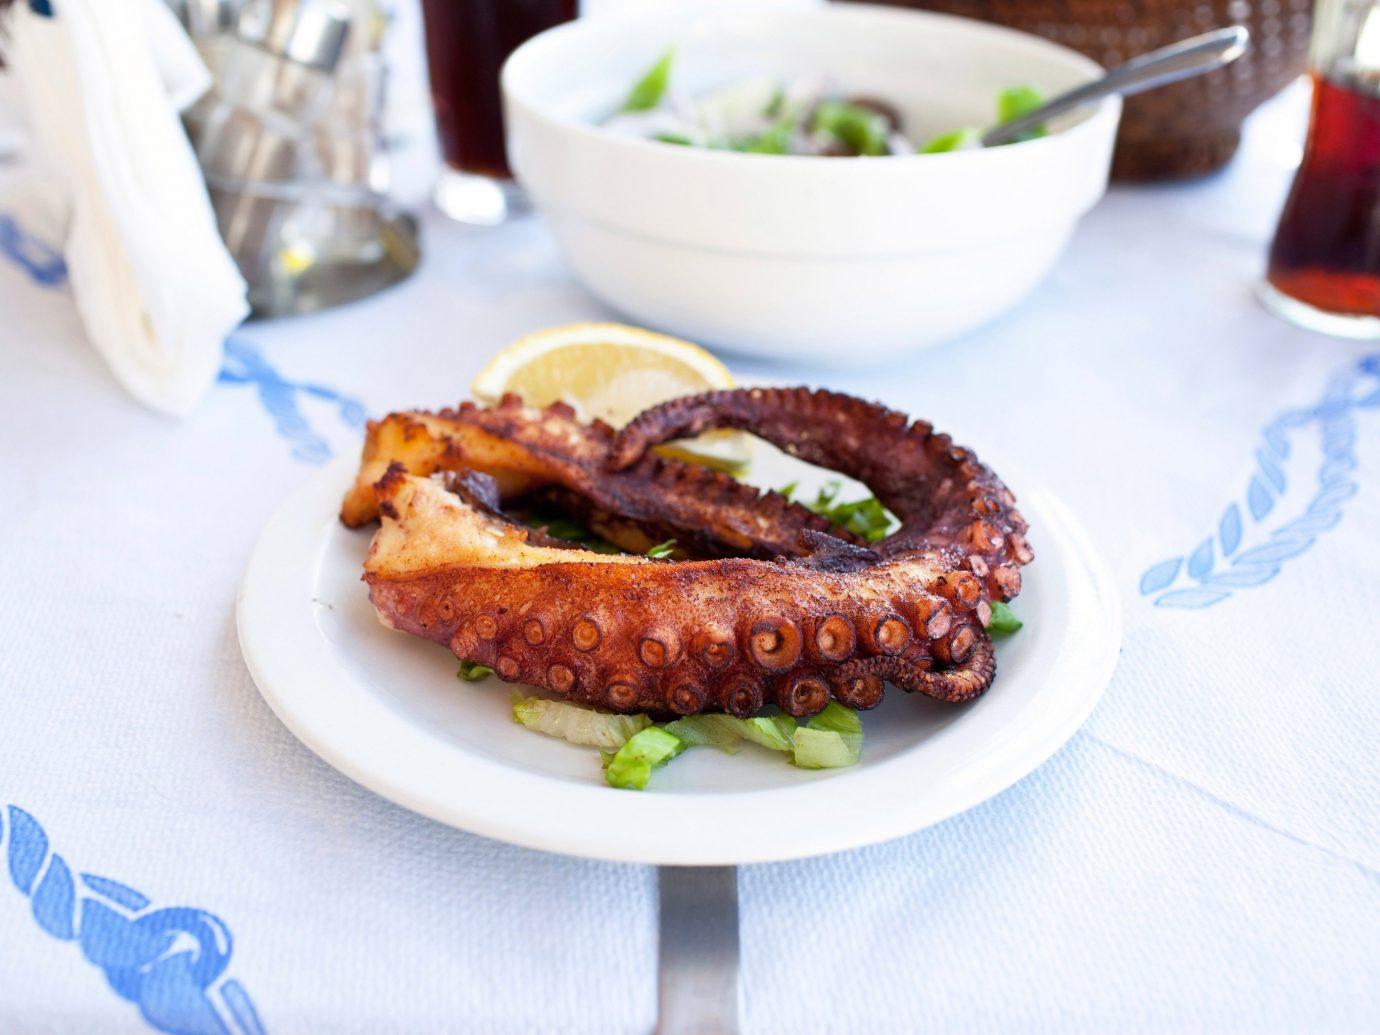 Trip Ideas plate table food dish meat fried food meal breakfast produce cuisine vegetable bratwurst sausage